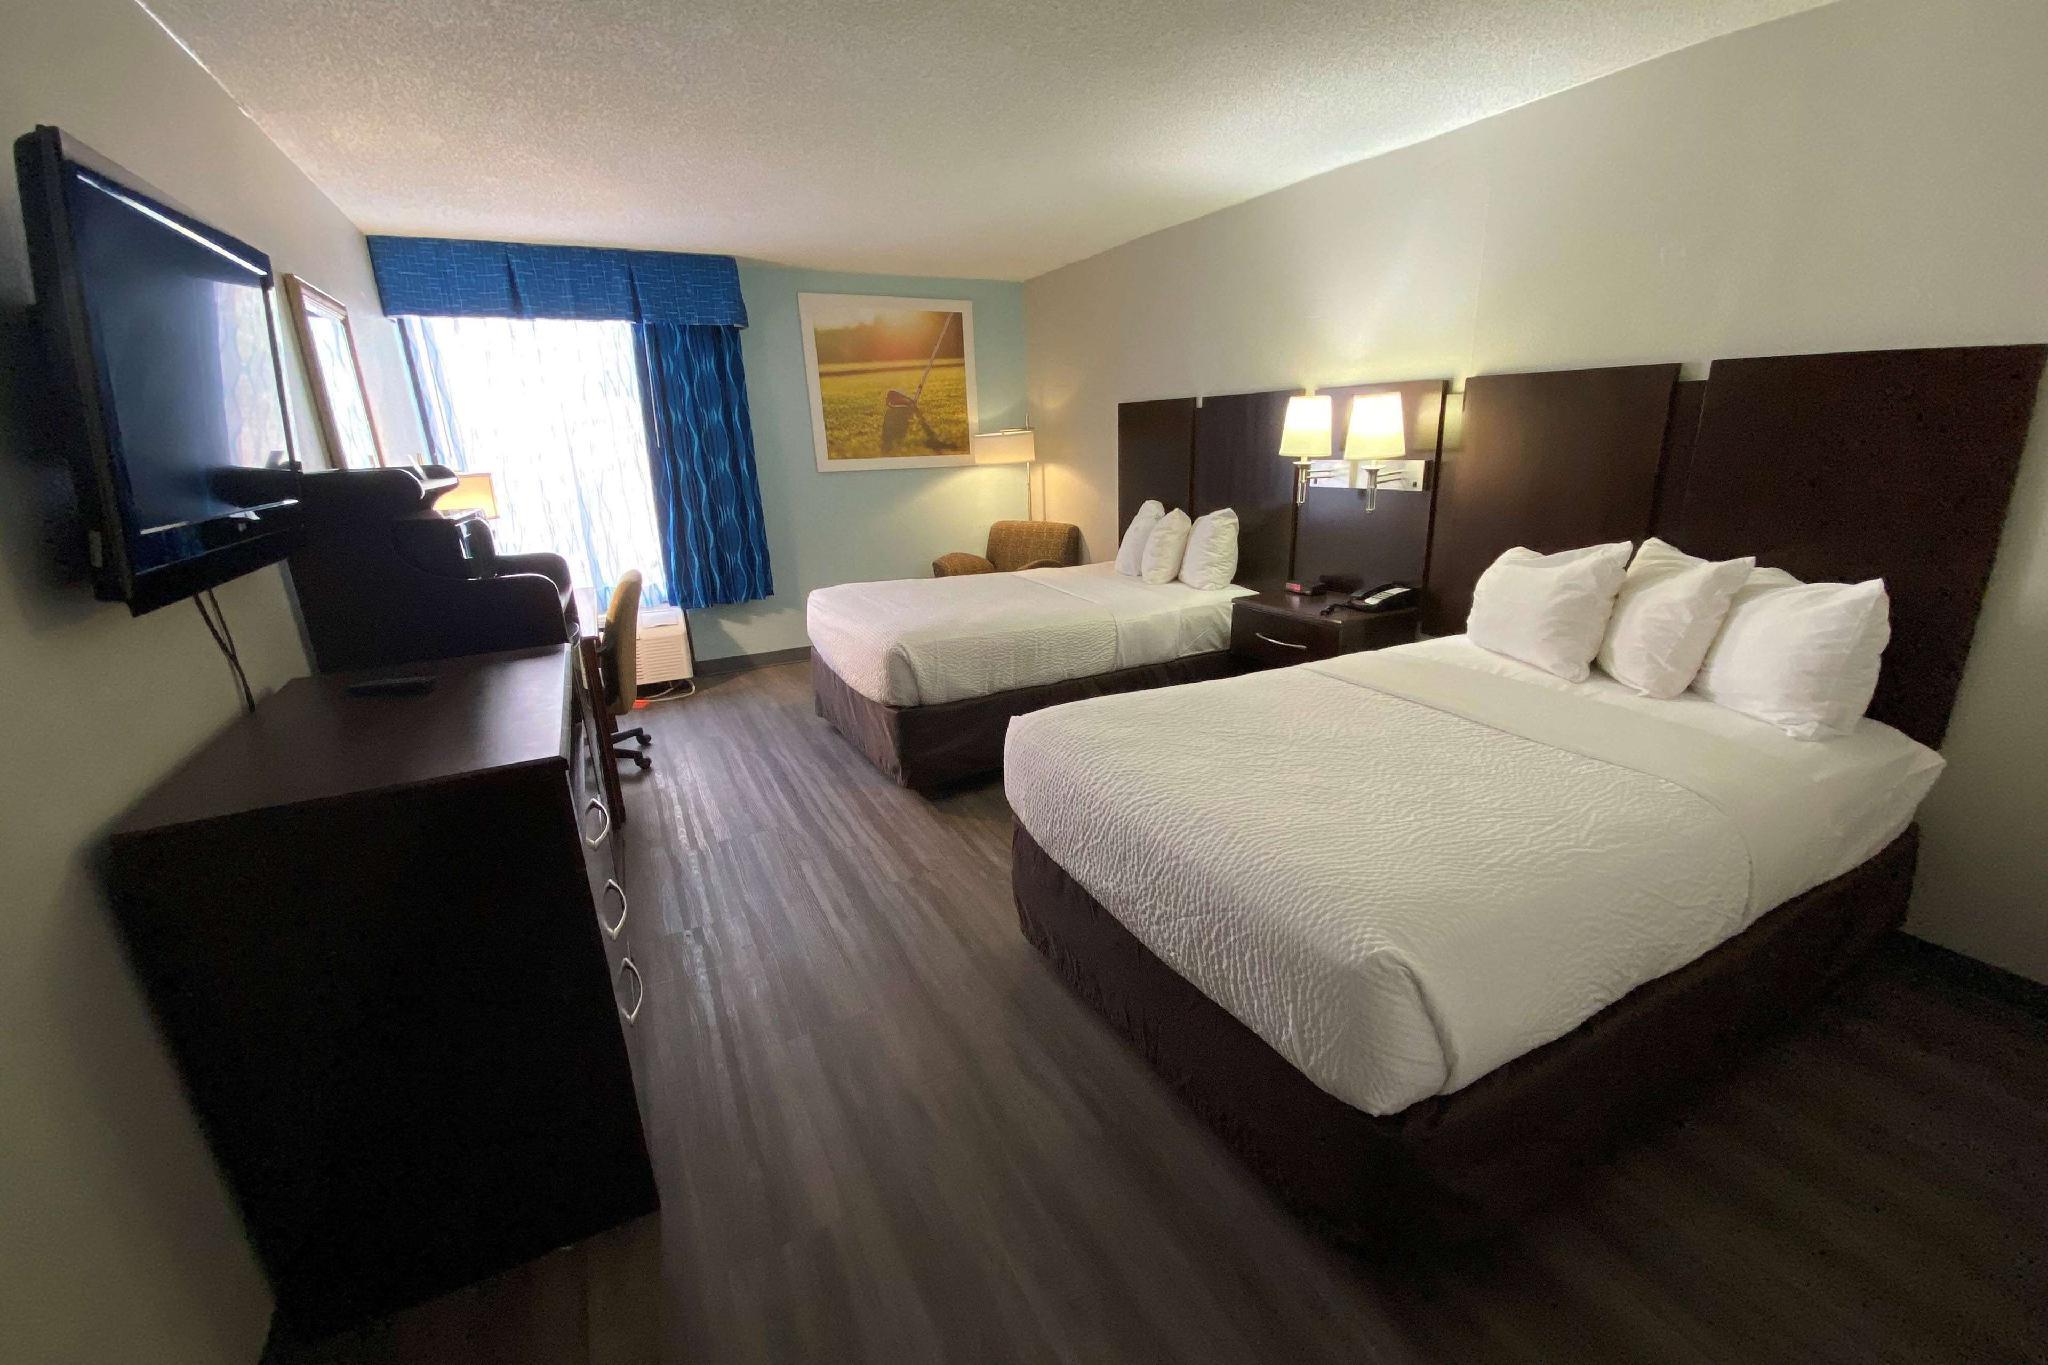 2 Double Beds, One-Bedroom, Efficiency Suite, Non-Smoking